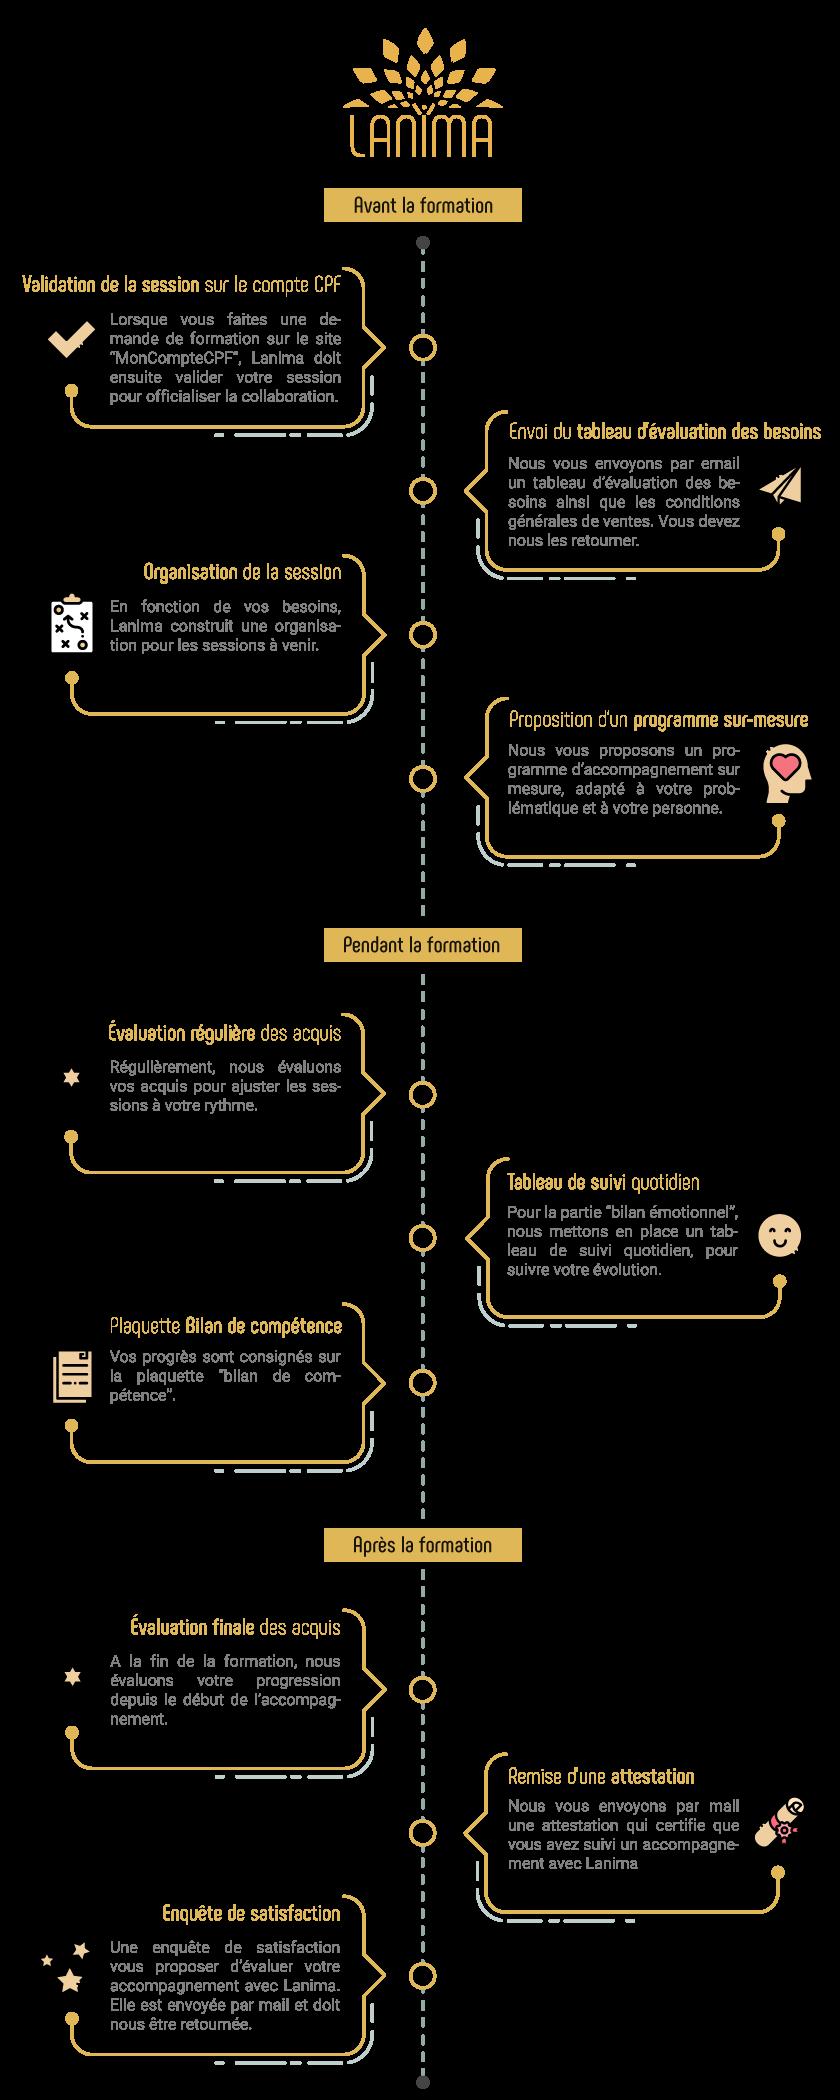 étapes clés lanima formation